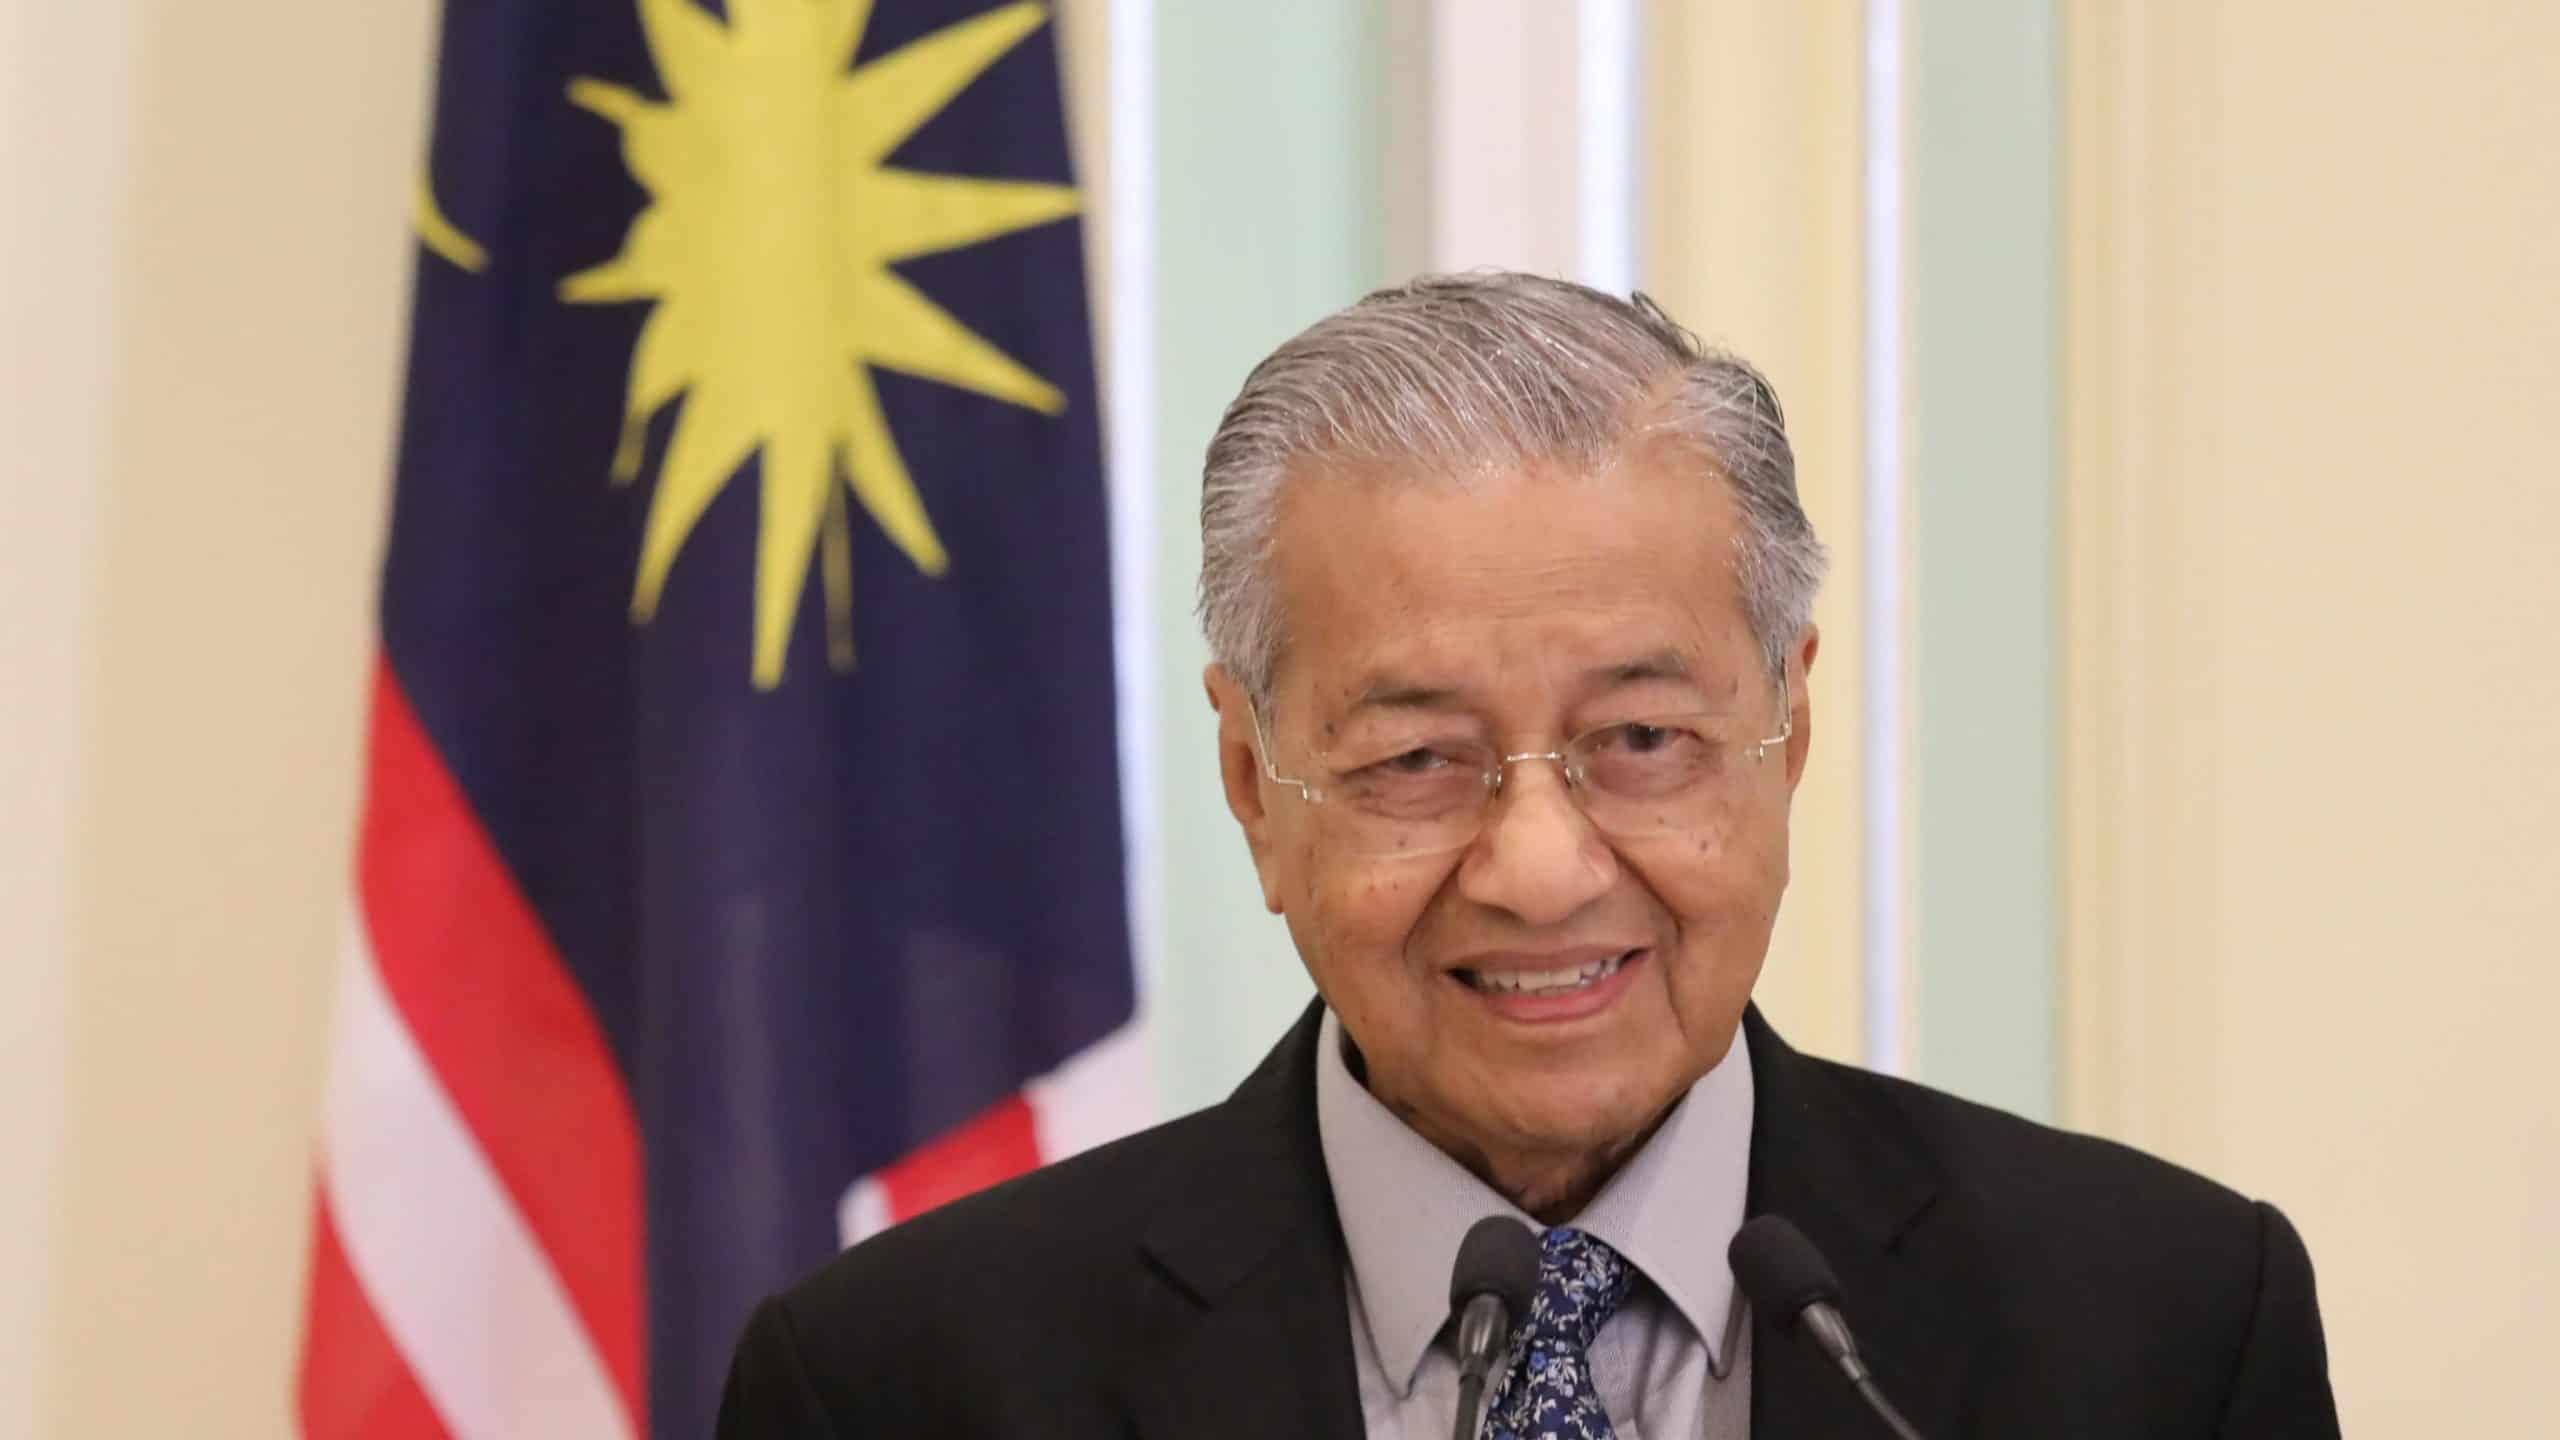 Pertumbuhan ekonomi Malaysia perlahan, terendah dalam 10 tahun